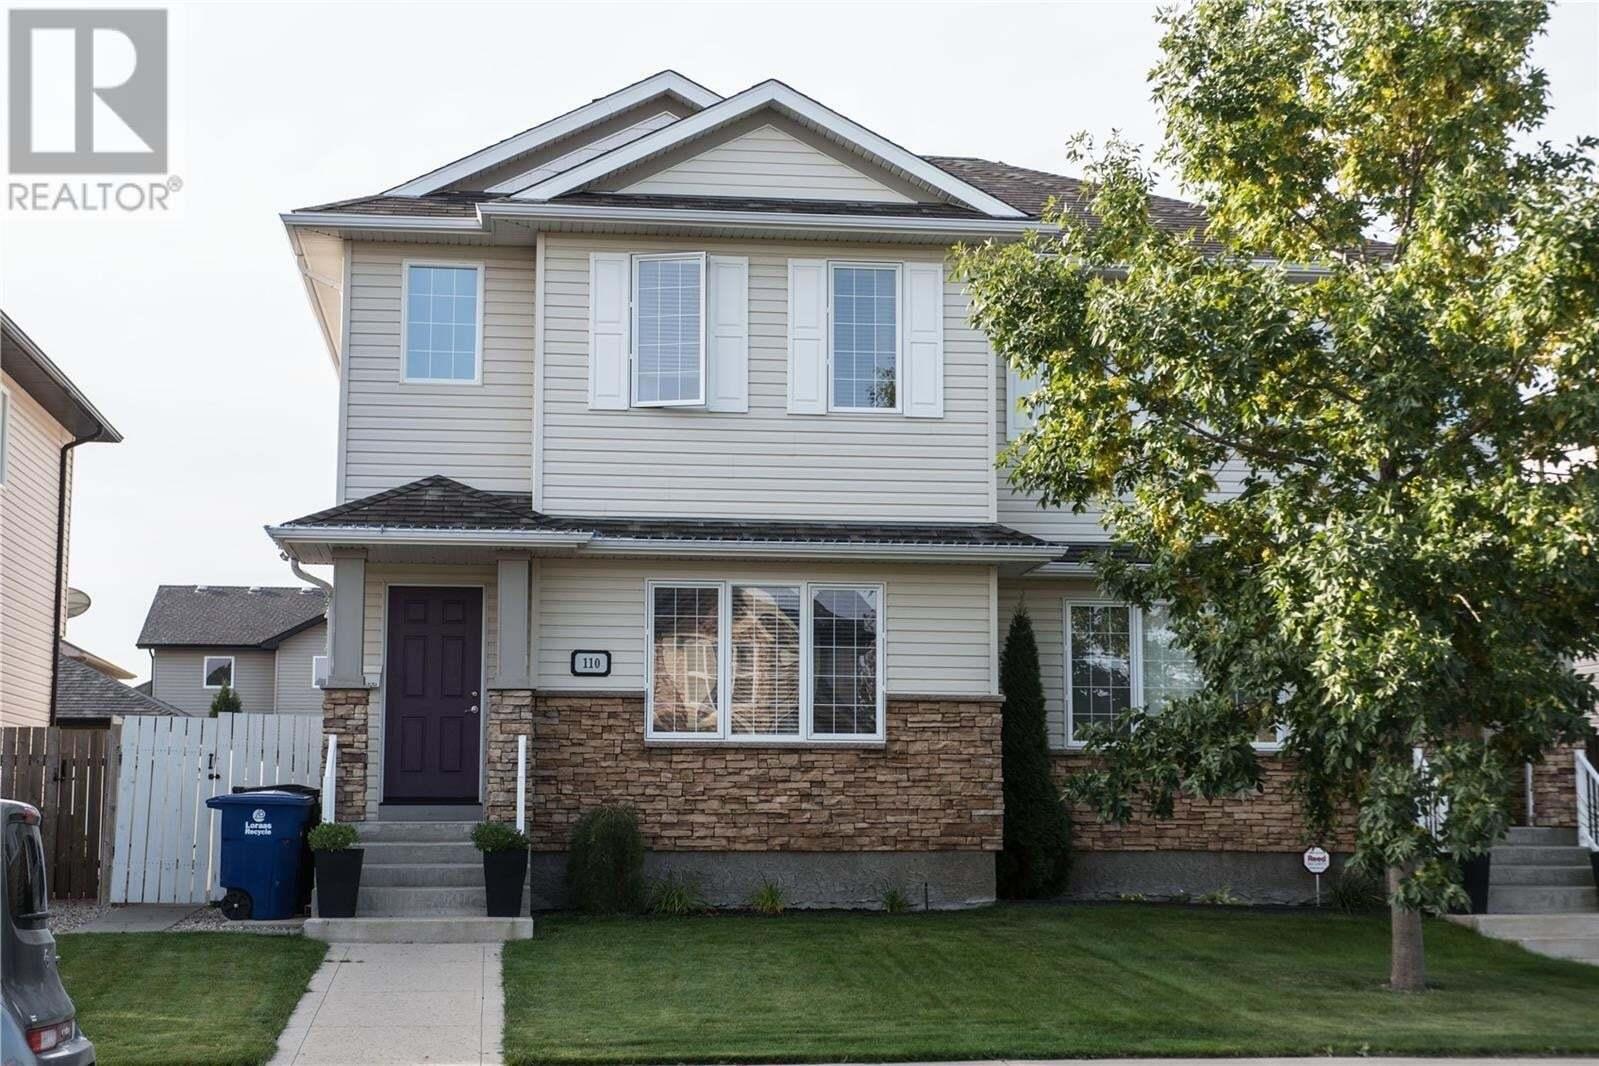 House for sale at 110 Lynd Cres Saskatoon Saskatchewan - MLS: SK827319